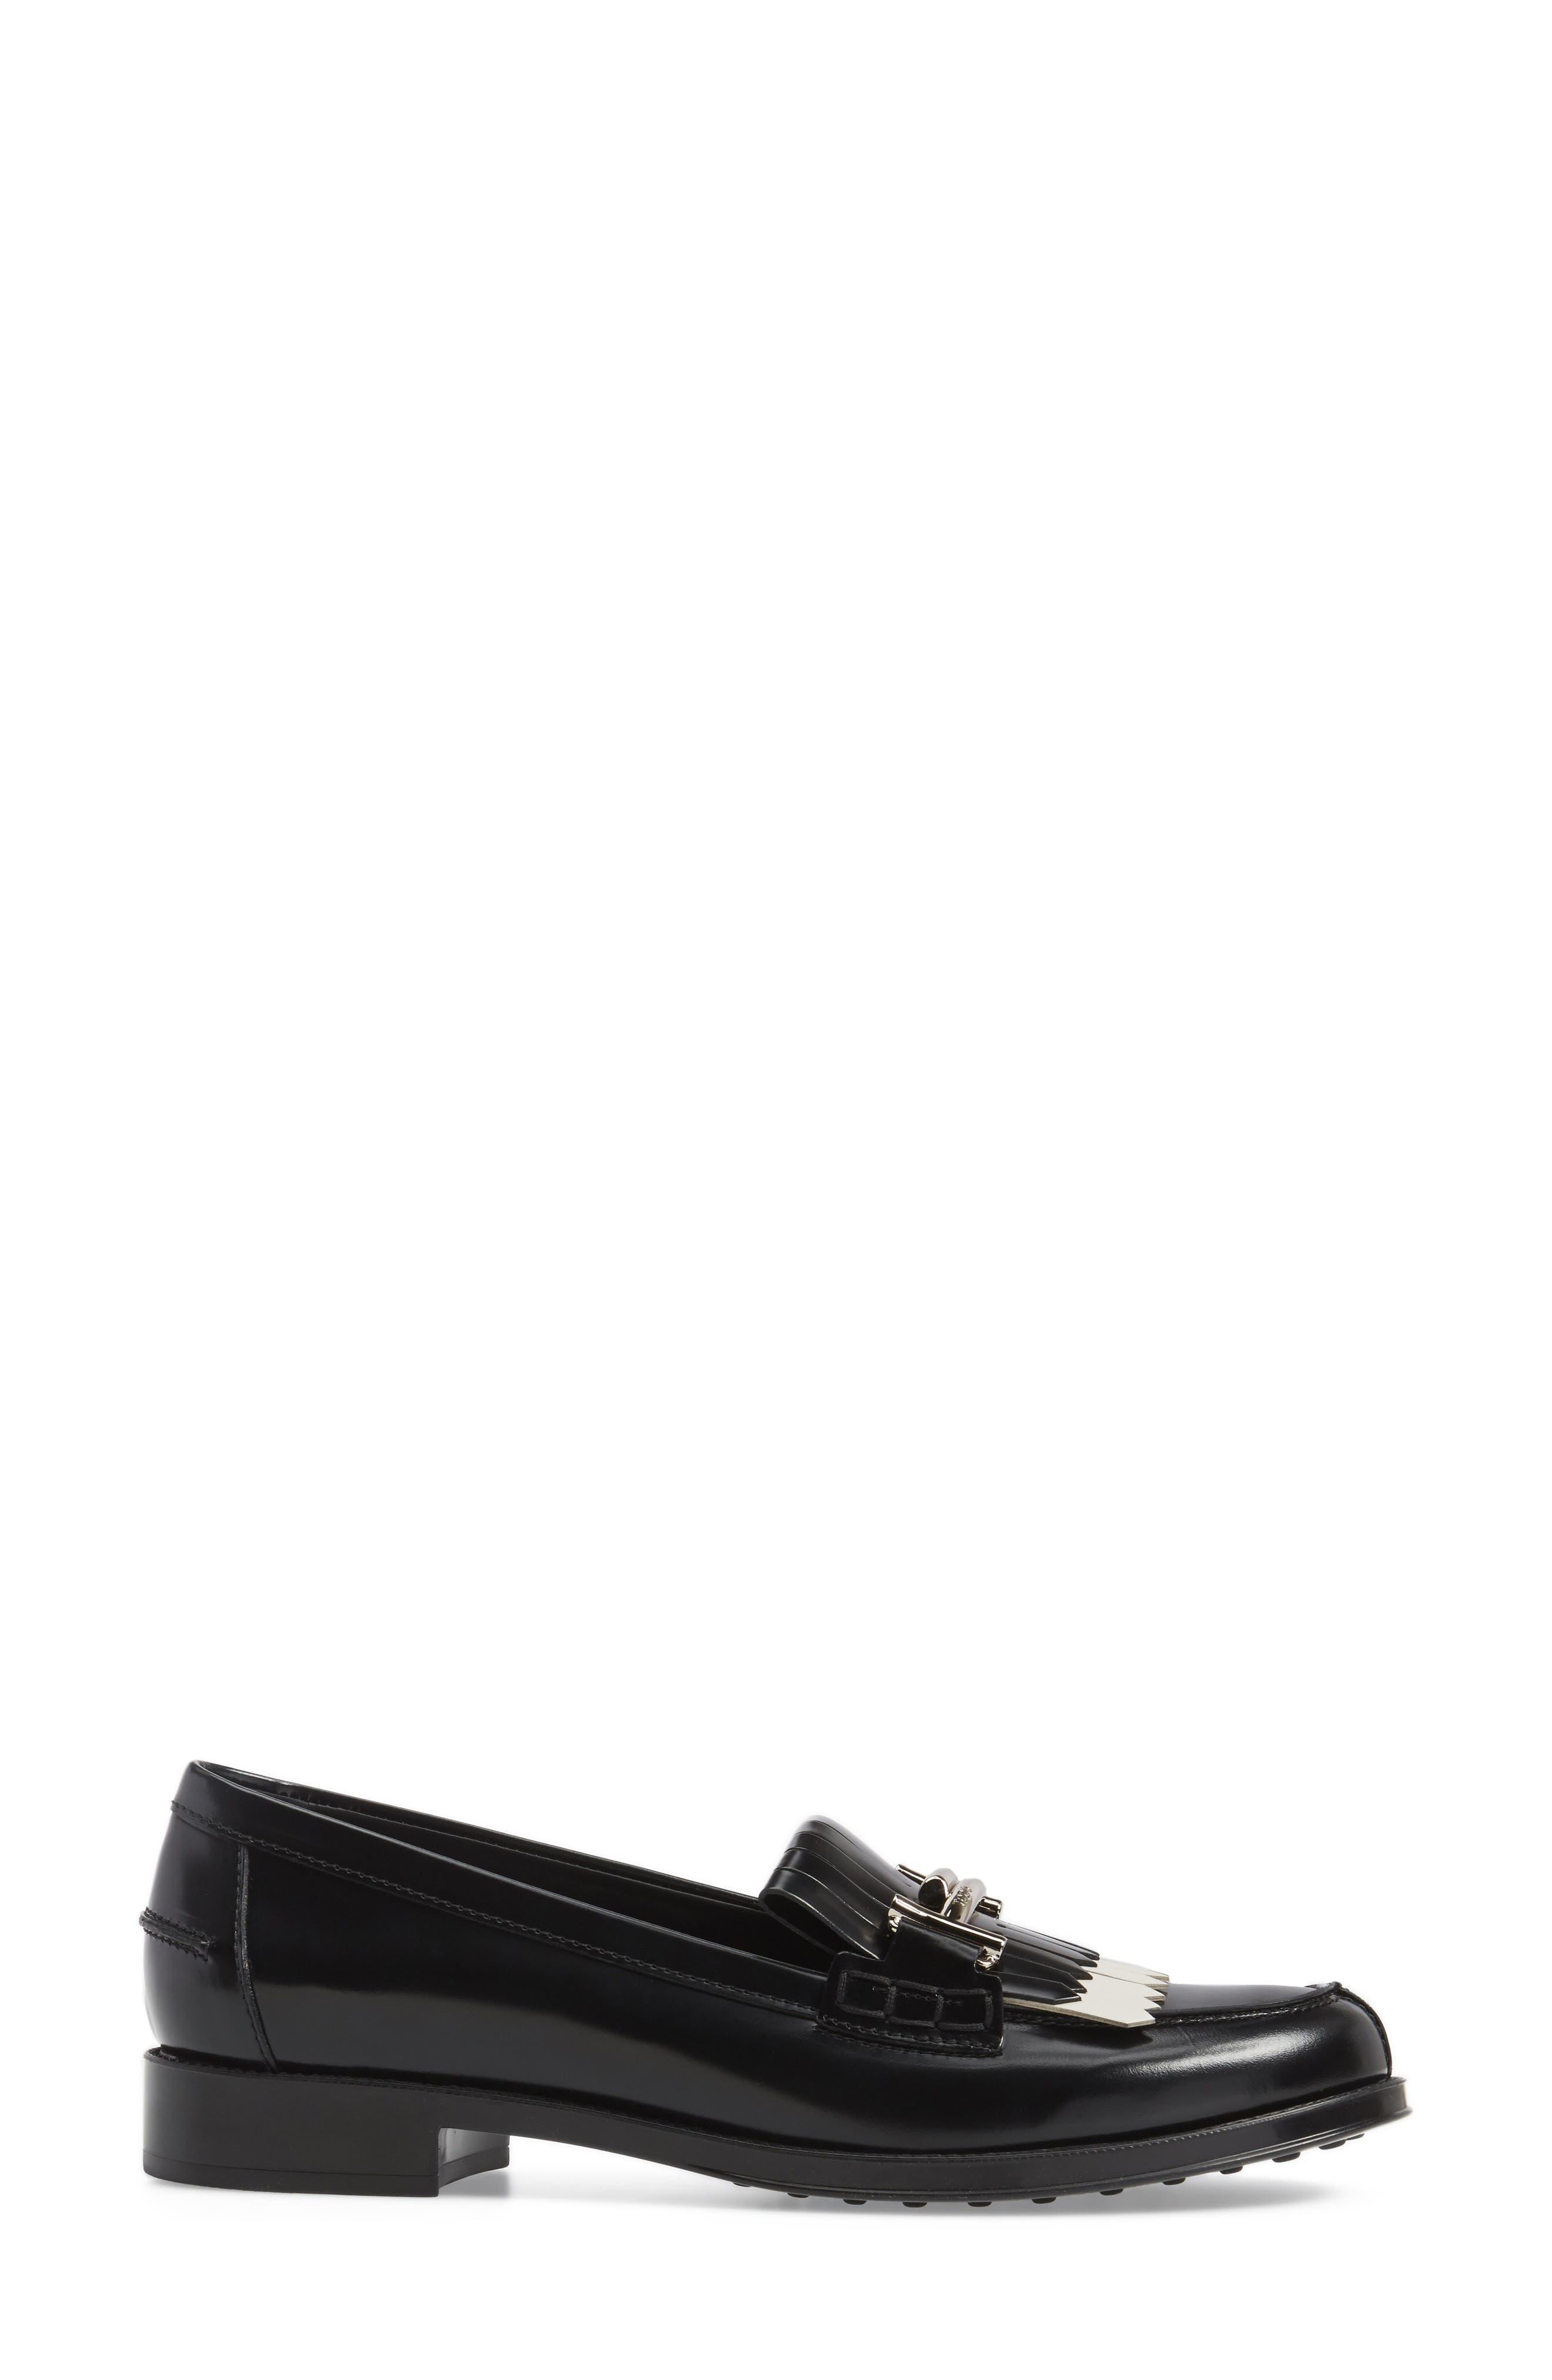 Double T Kiltie Fringe Loafer,                             Alternate thumbnail 3, color,                             001